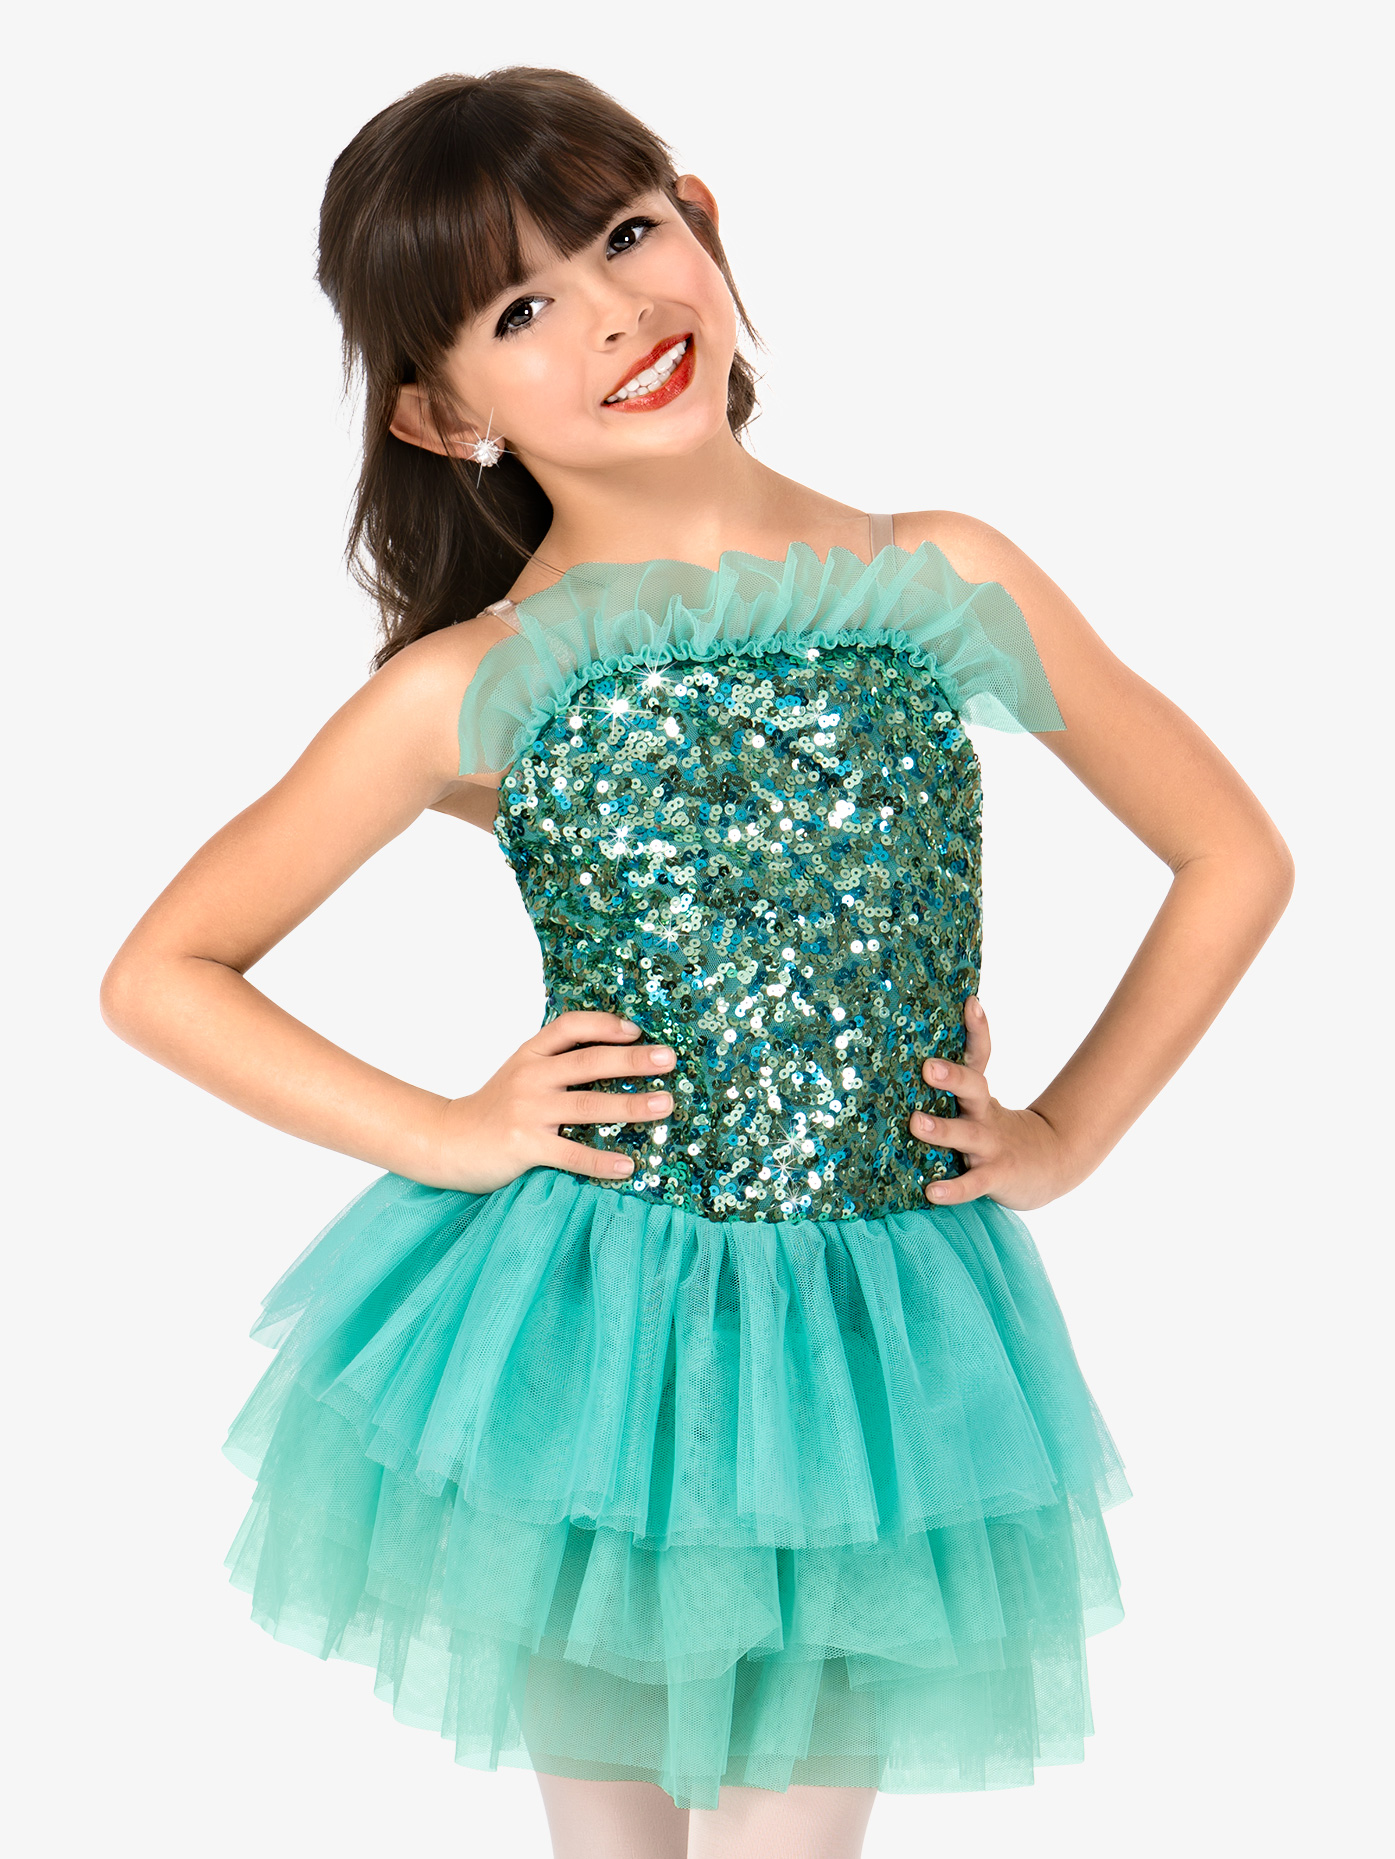 Gracie Girls Sequin Camisole Performance Tutu Dress N7454C